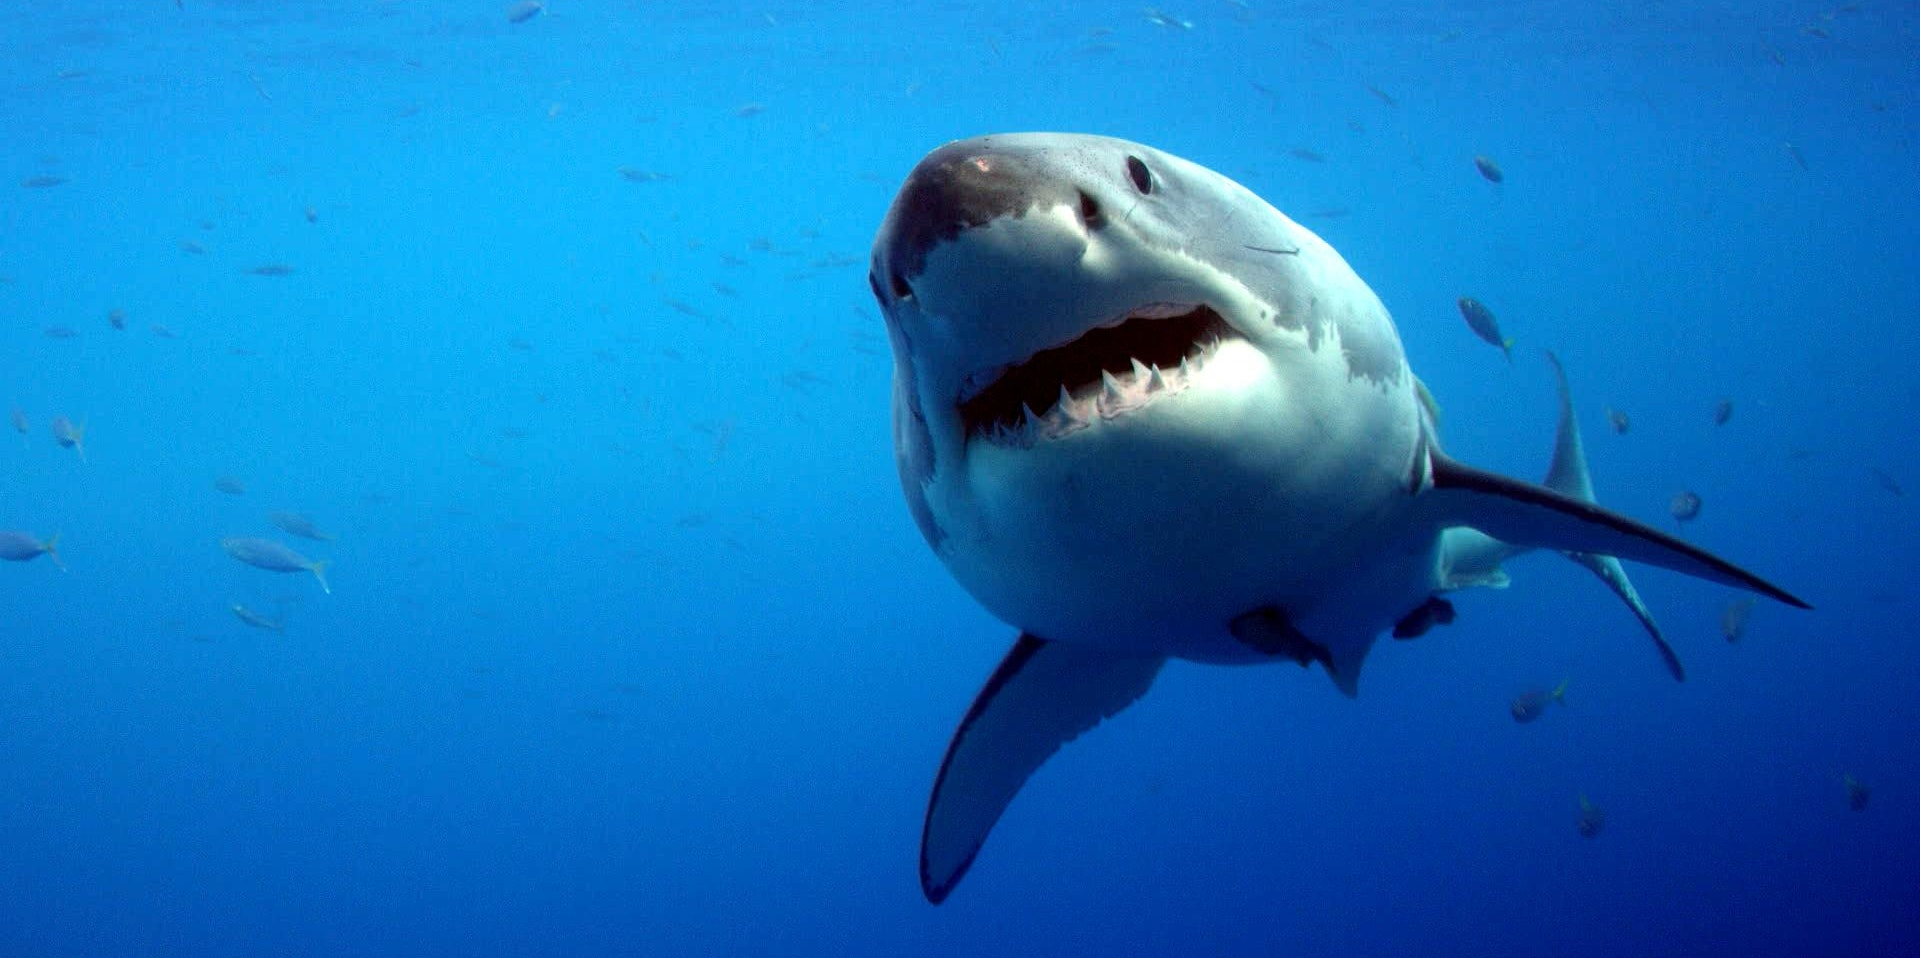 Rare Great White Shark Nursery Is Terrifying, but Kinda Cute